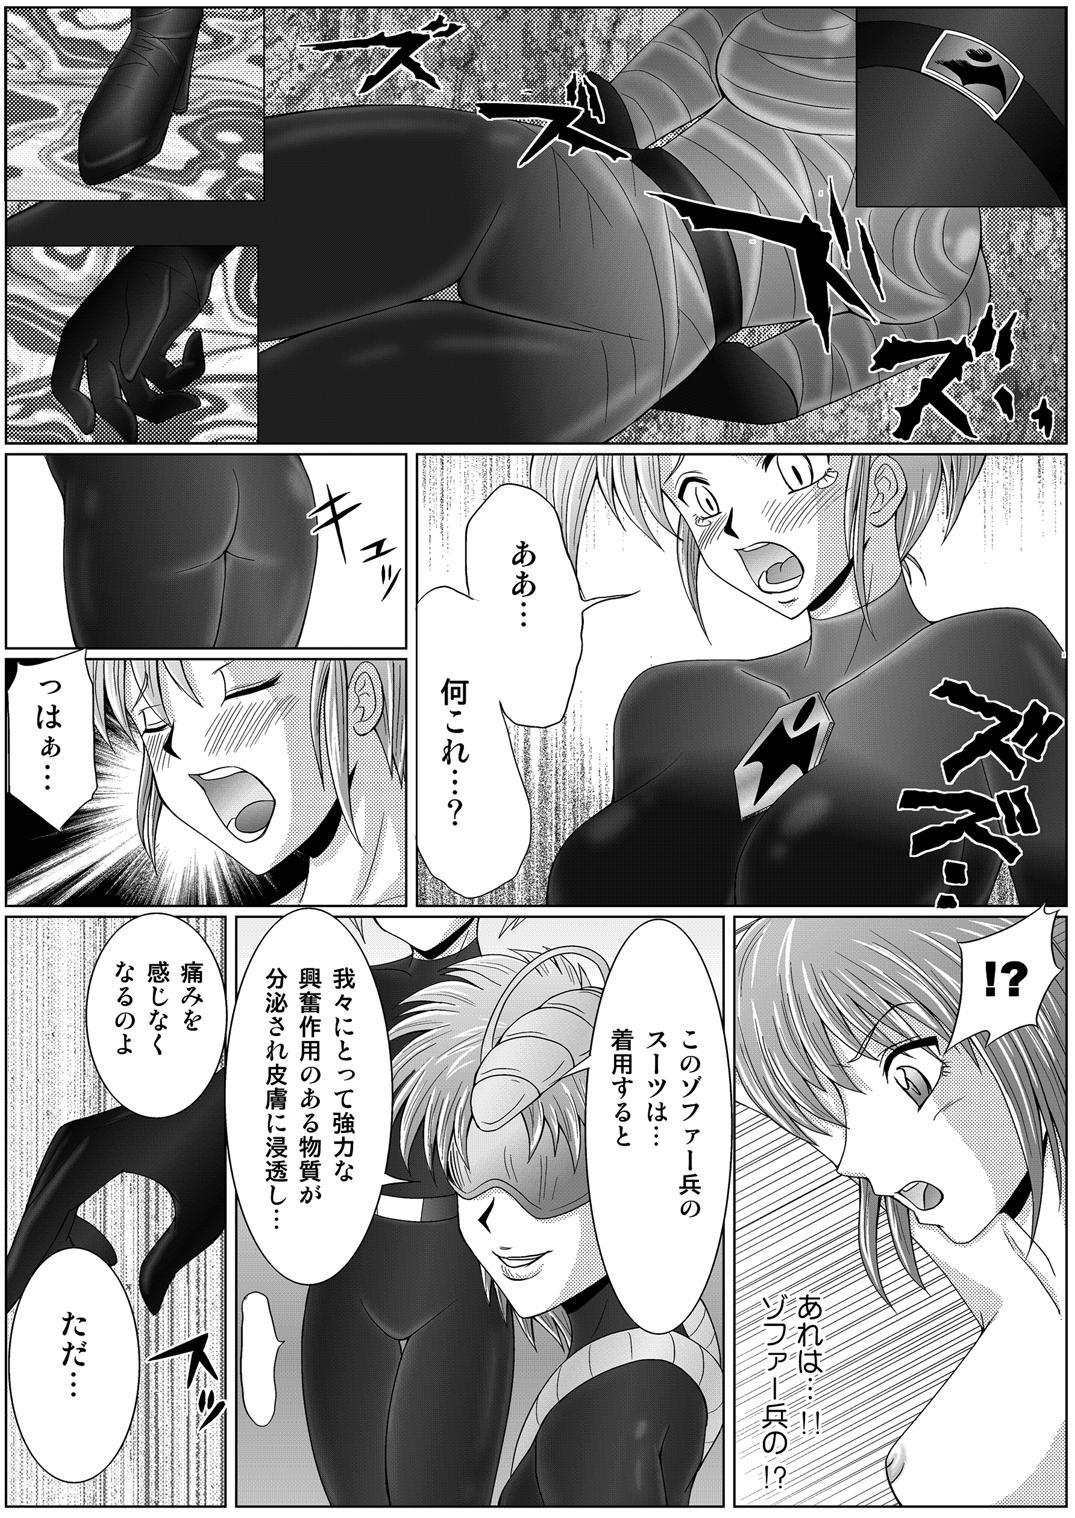 [Macxe's (monmon)] Tokubousentai Dinaranger ~Heroine Kairaku Sennou Keikaku~ Vol.01/02/03 (Renkaban) [Digital] 22